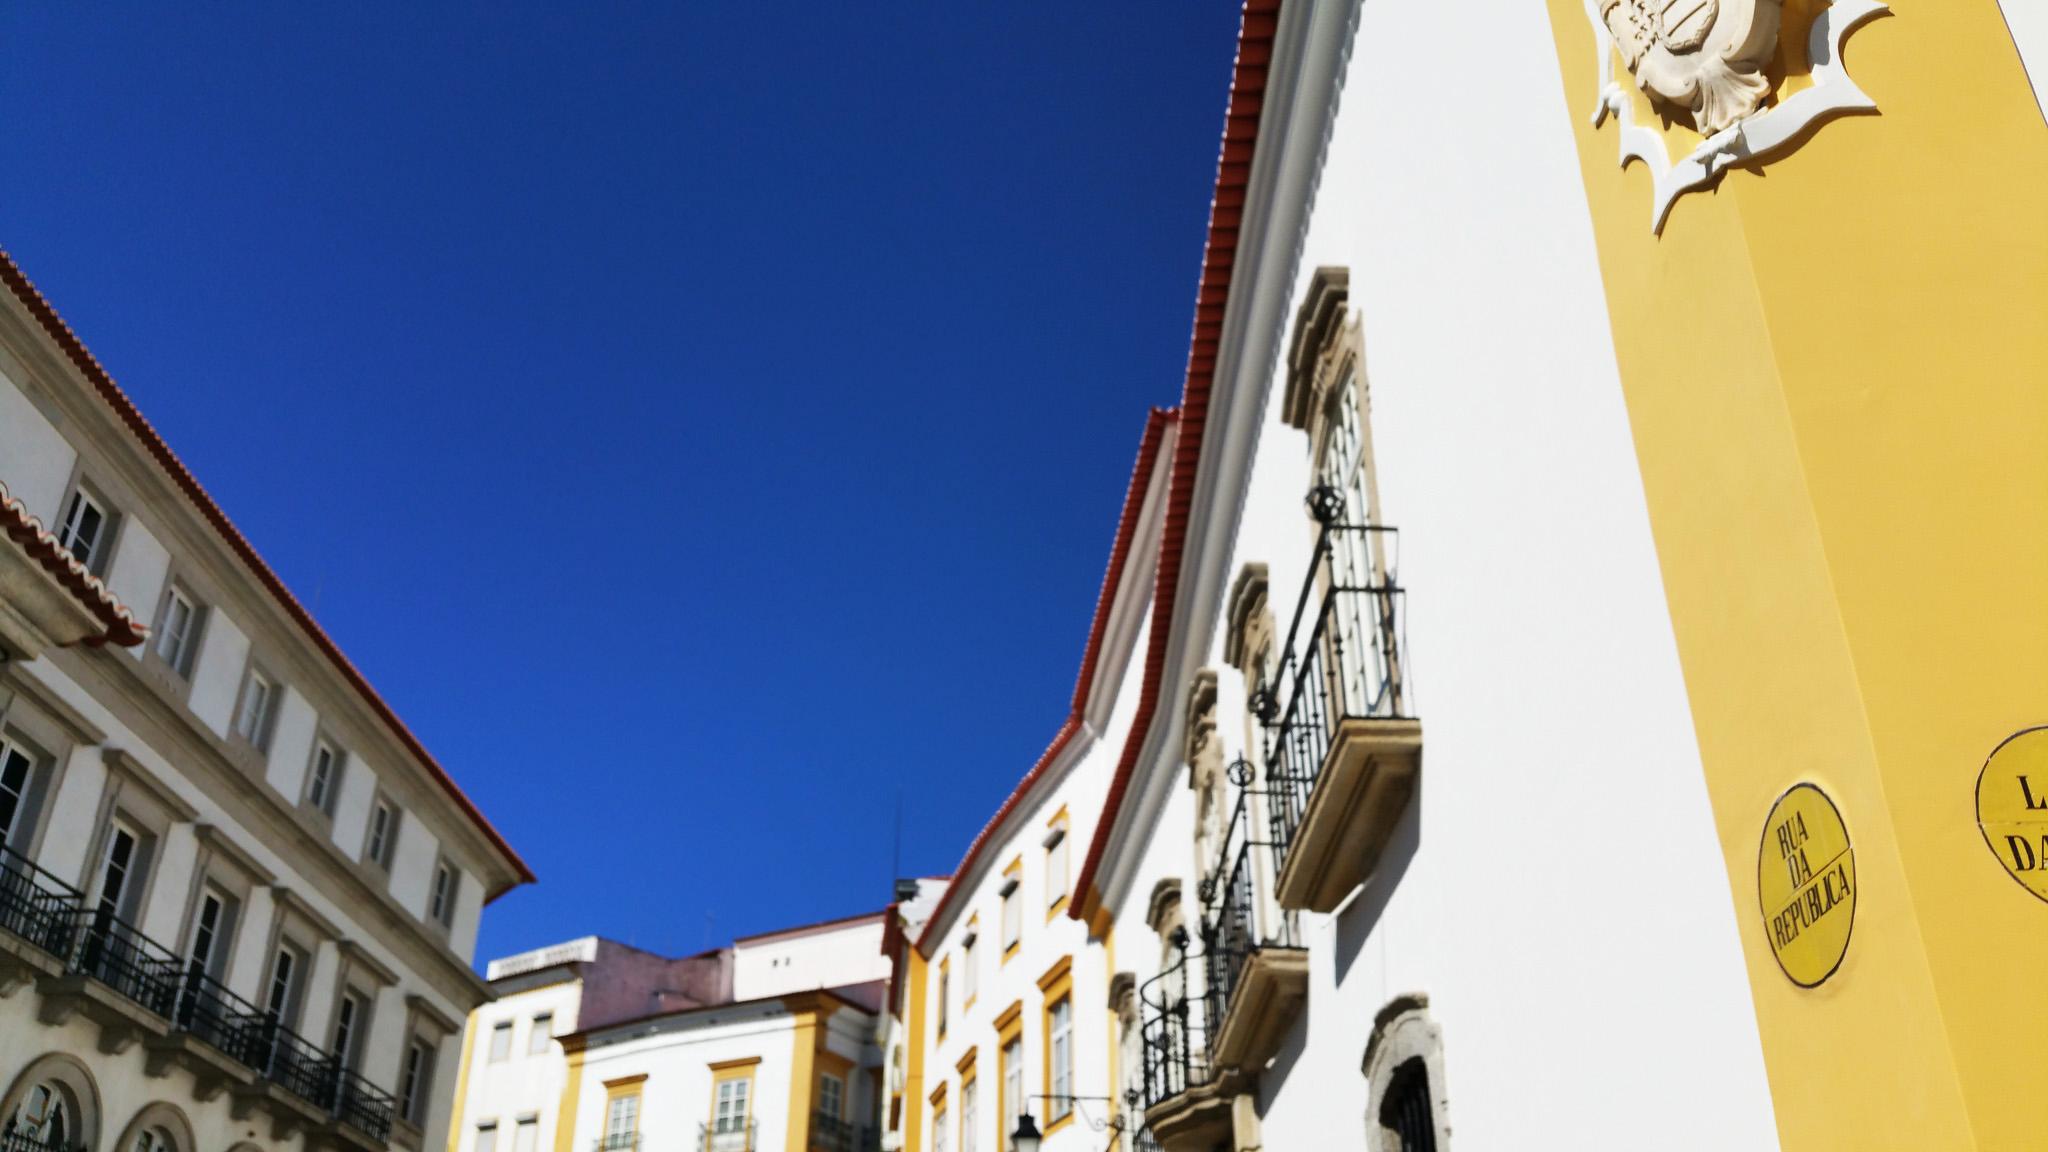 soi55_travel_blog_portugal_evora_architecture_colour